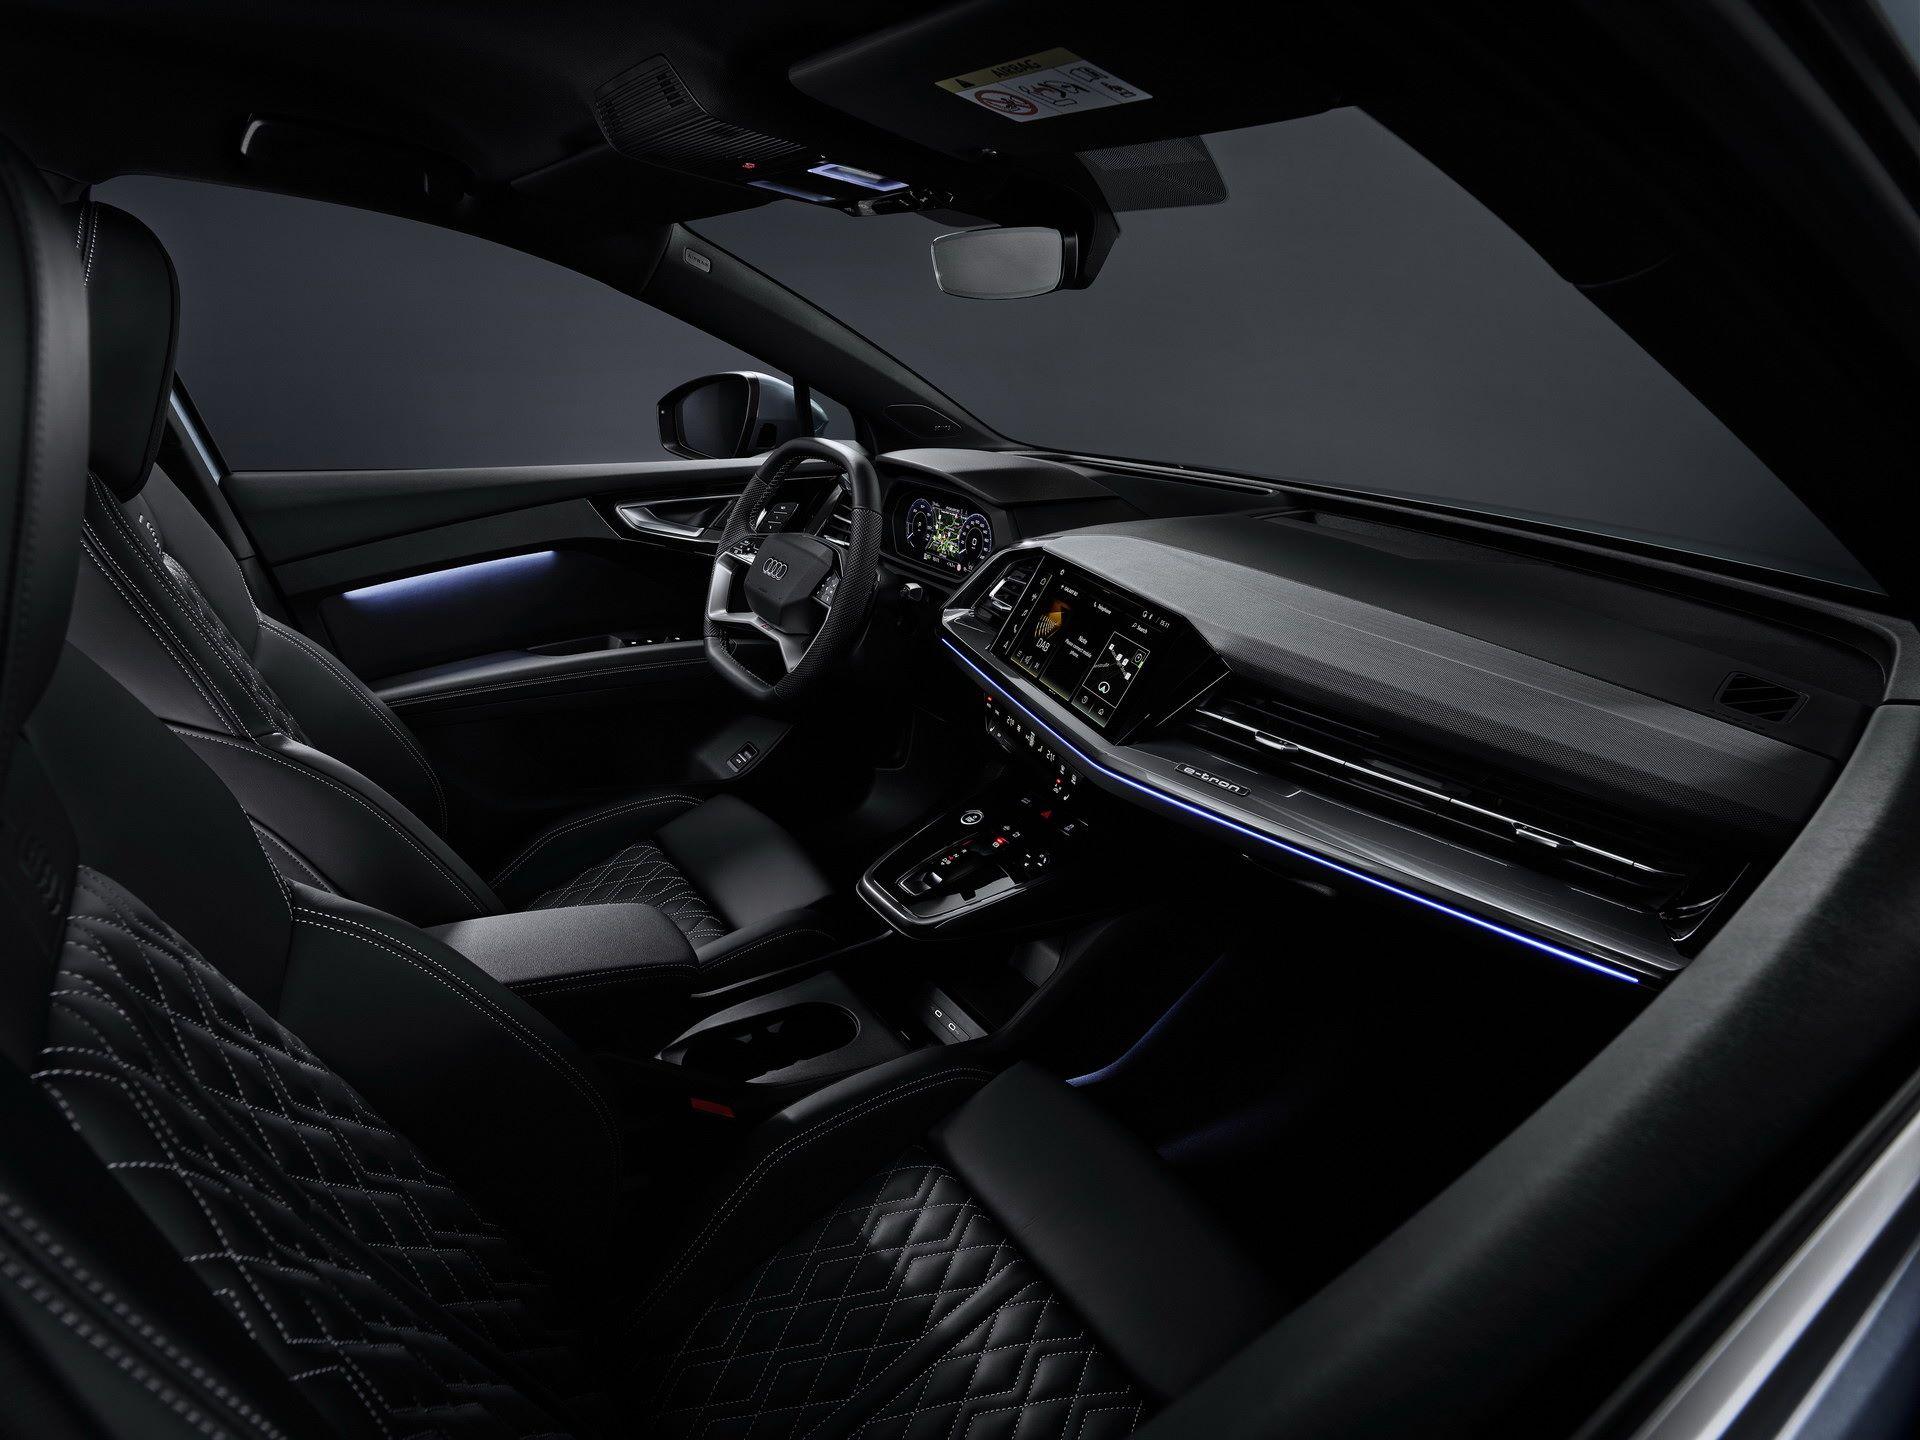 Audi-Q4-e-tron-and-Q4-e-tron-Sportback-70